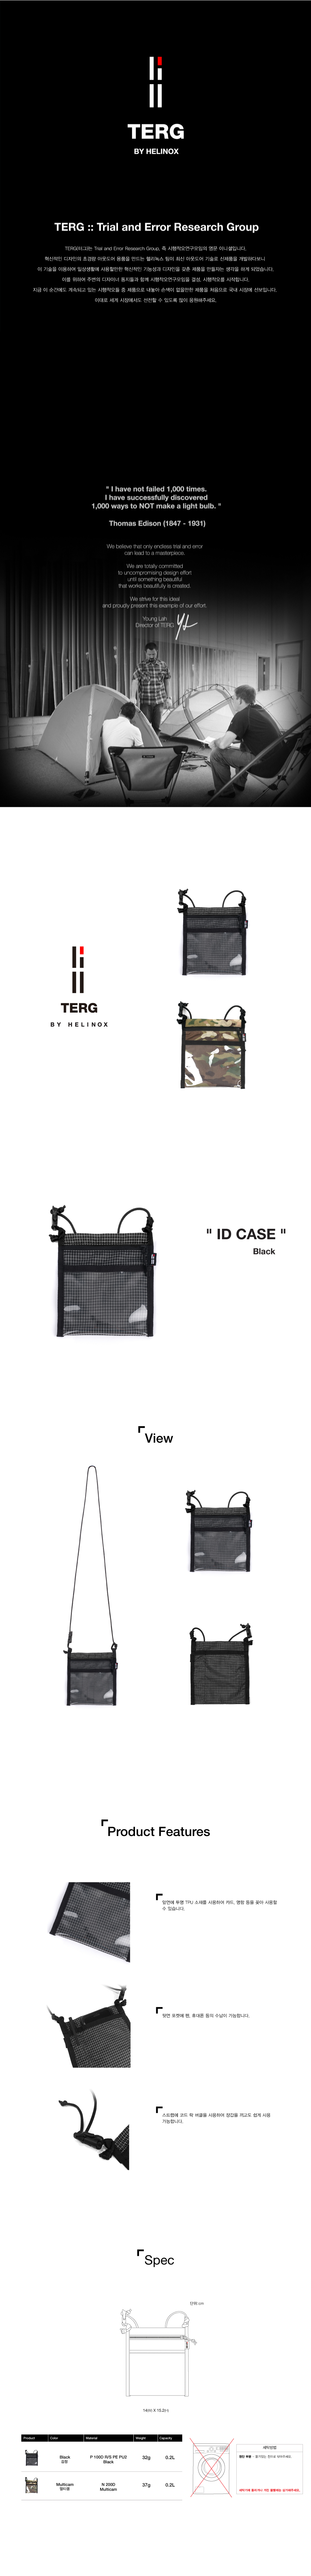 20180419_id-case_black.jpg